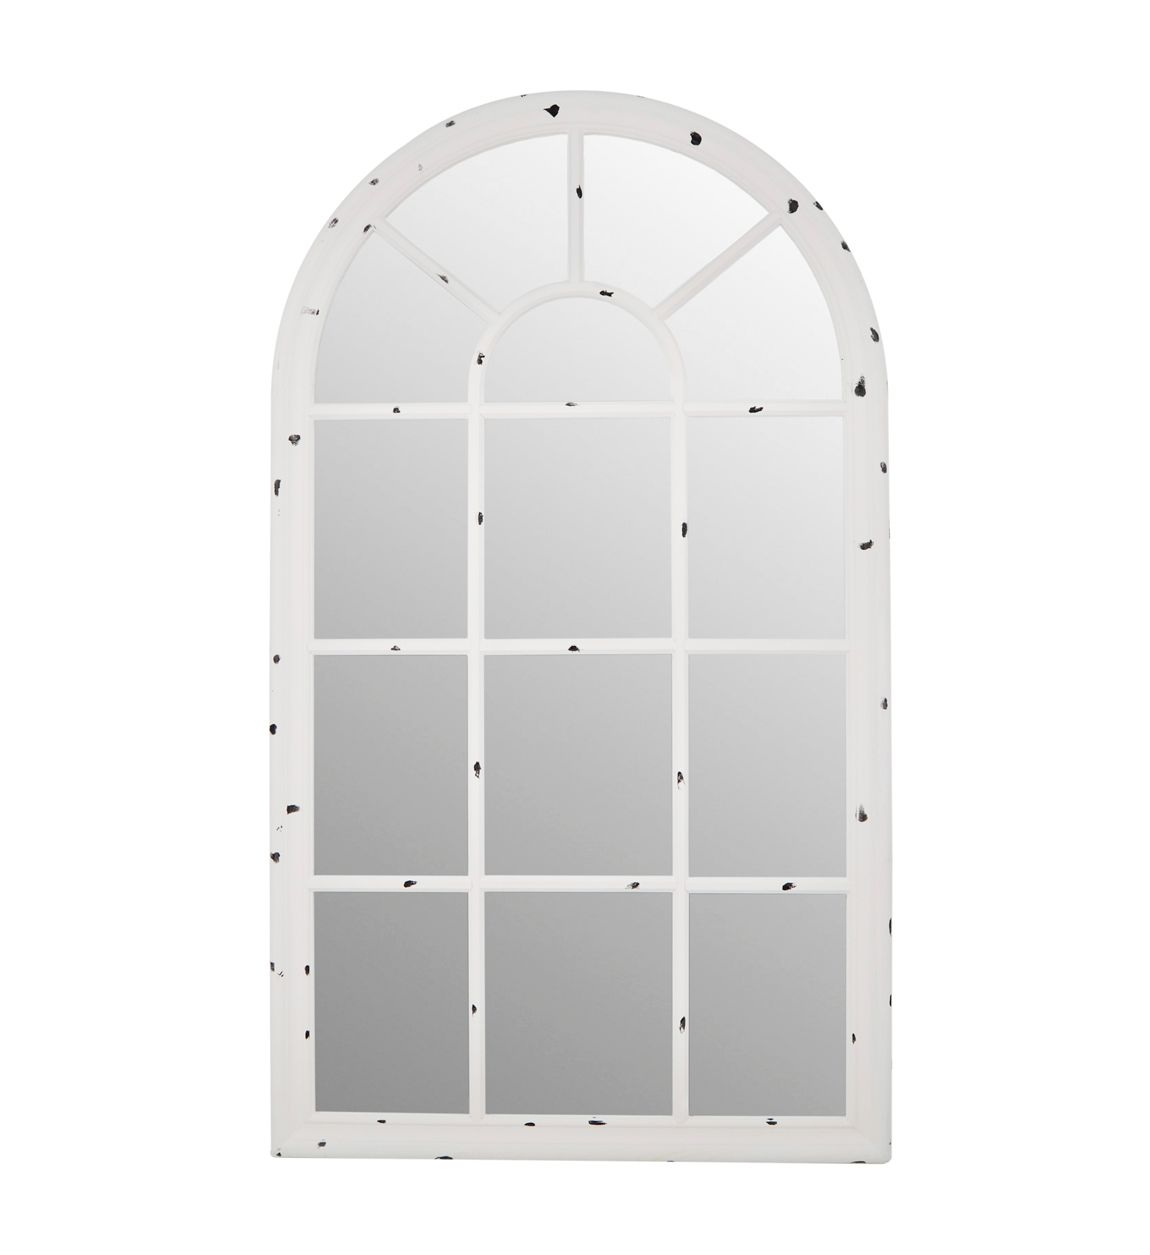 Oglinda decorativa cu rama din lemn, Dakota Alb, L140xl80 cm